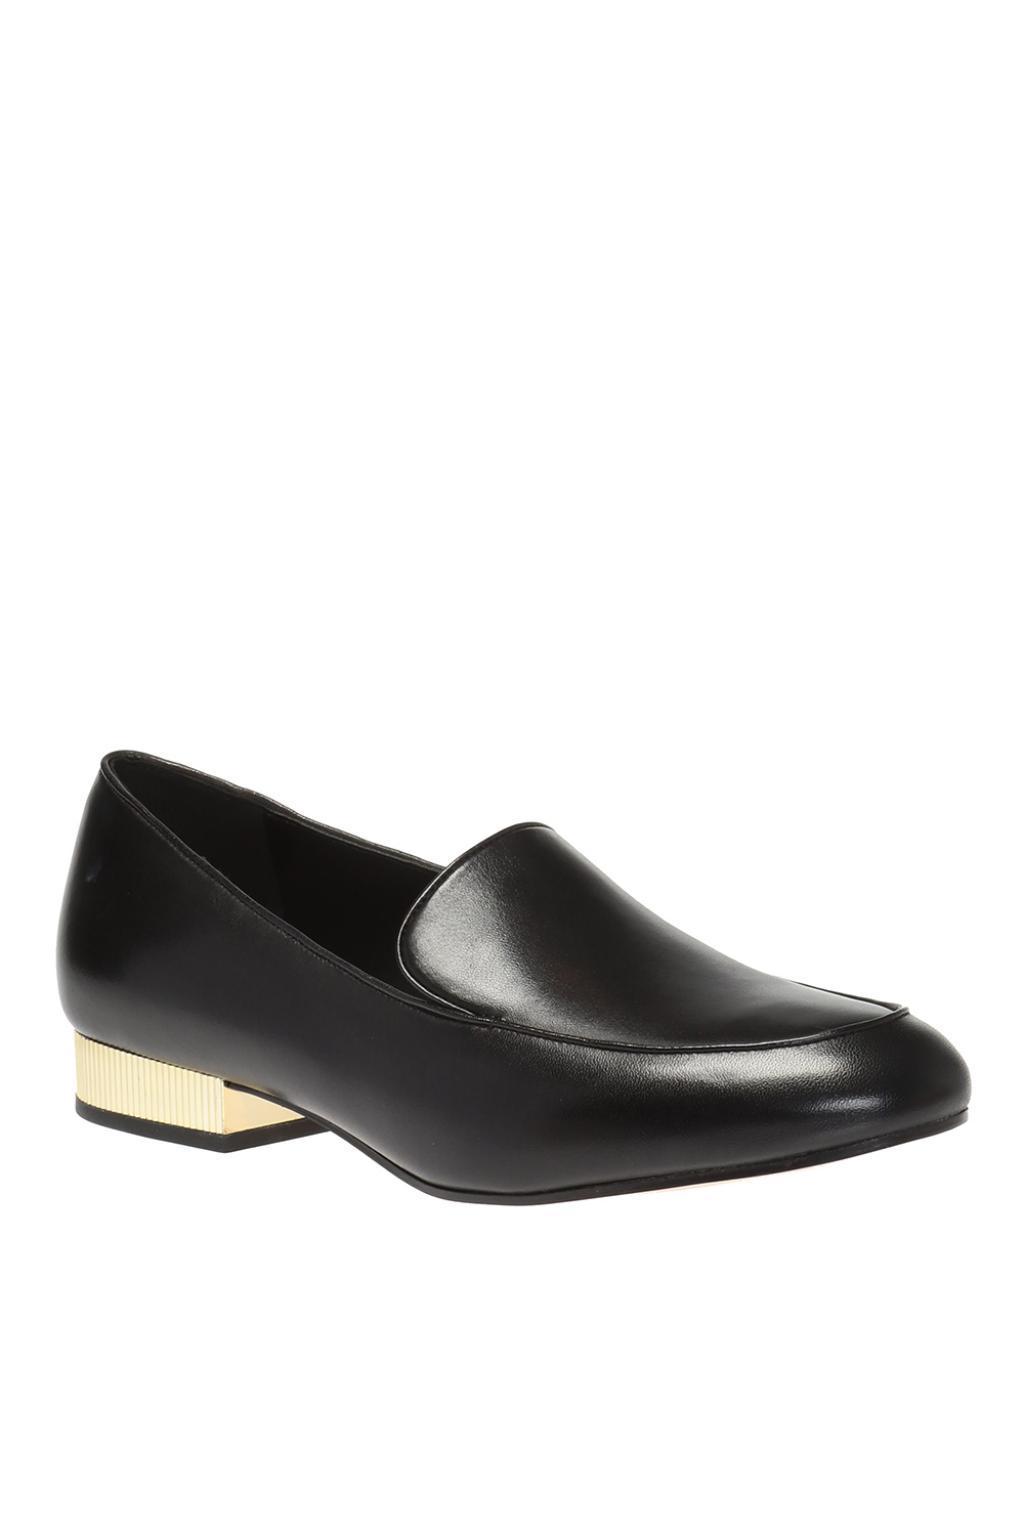 Michael Kors Leather Metal Heel Loafers